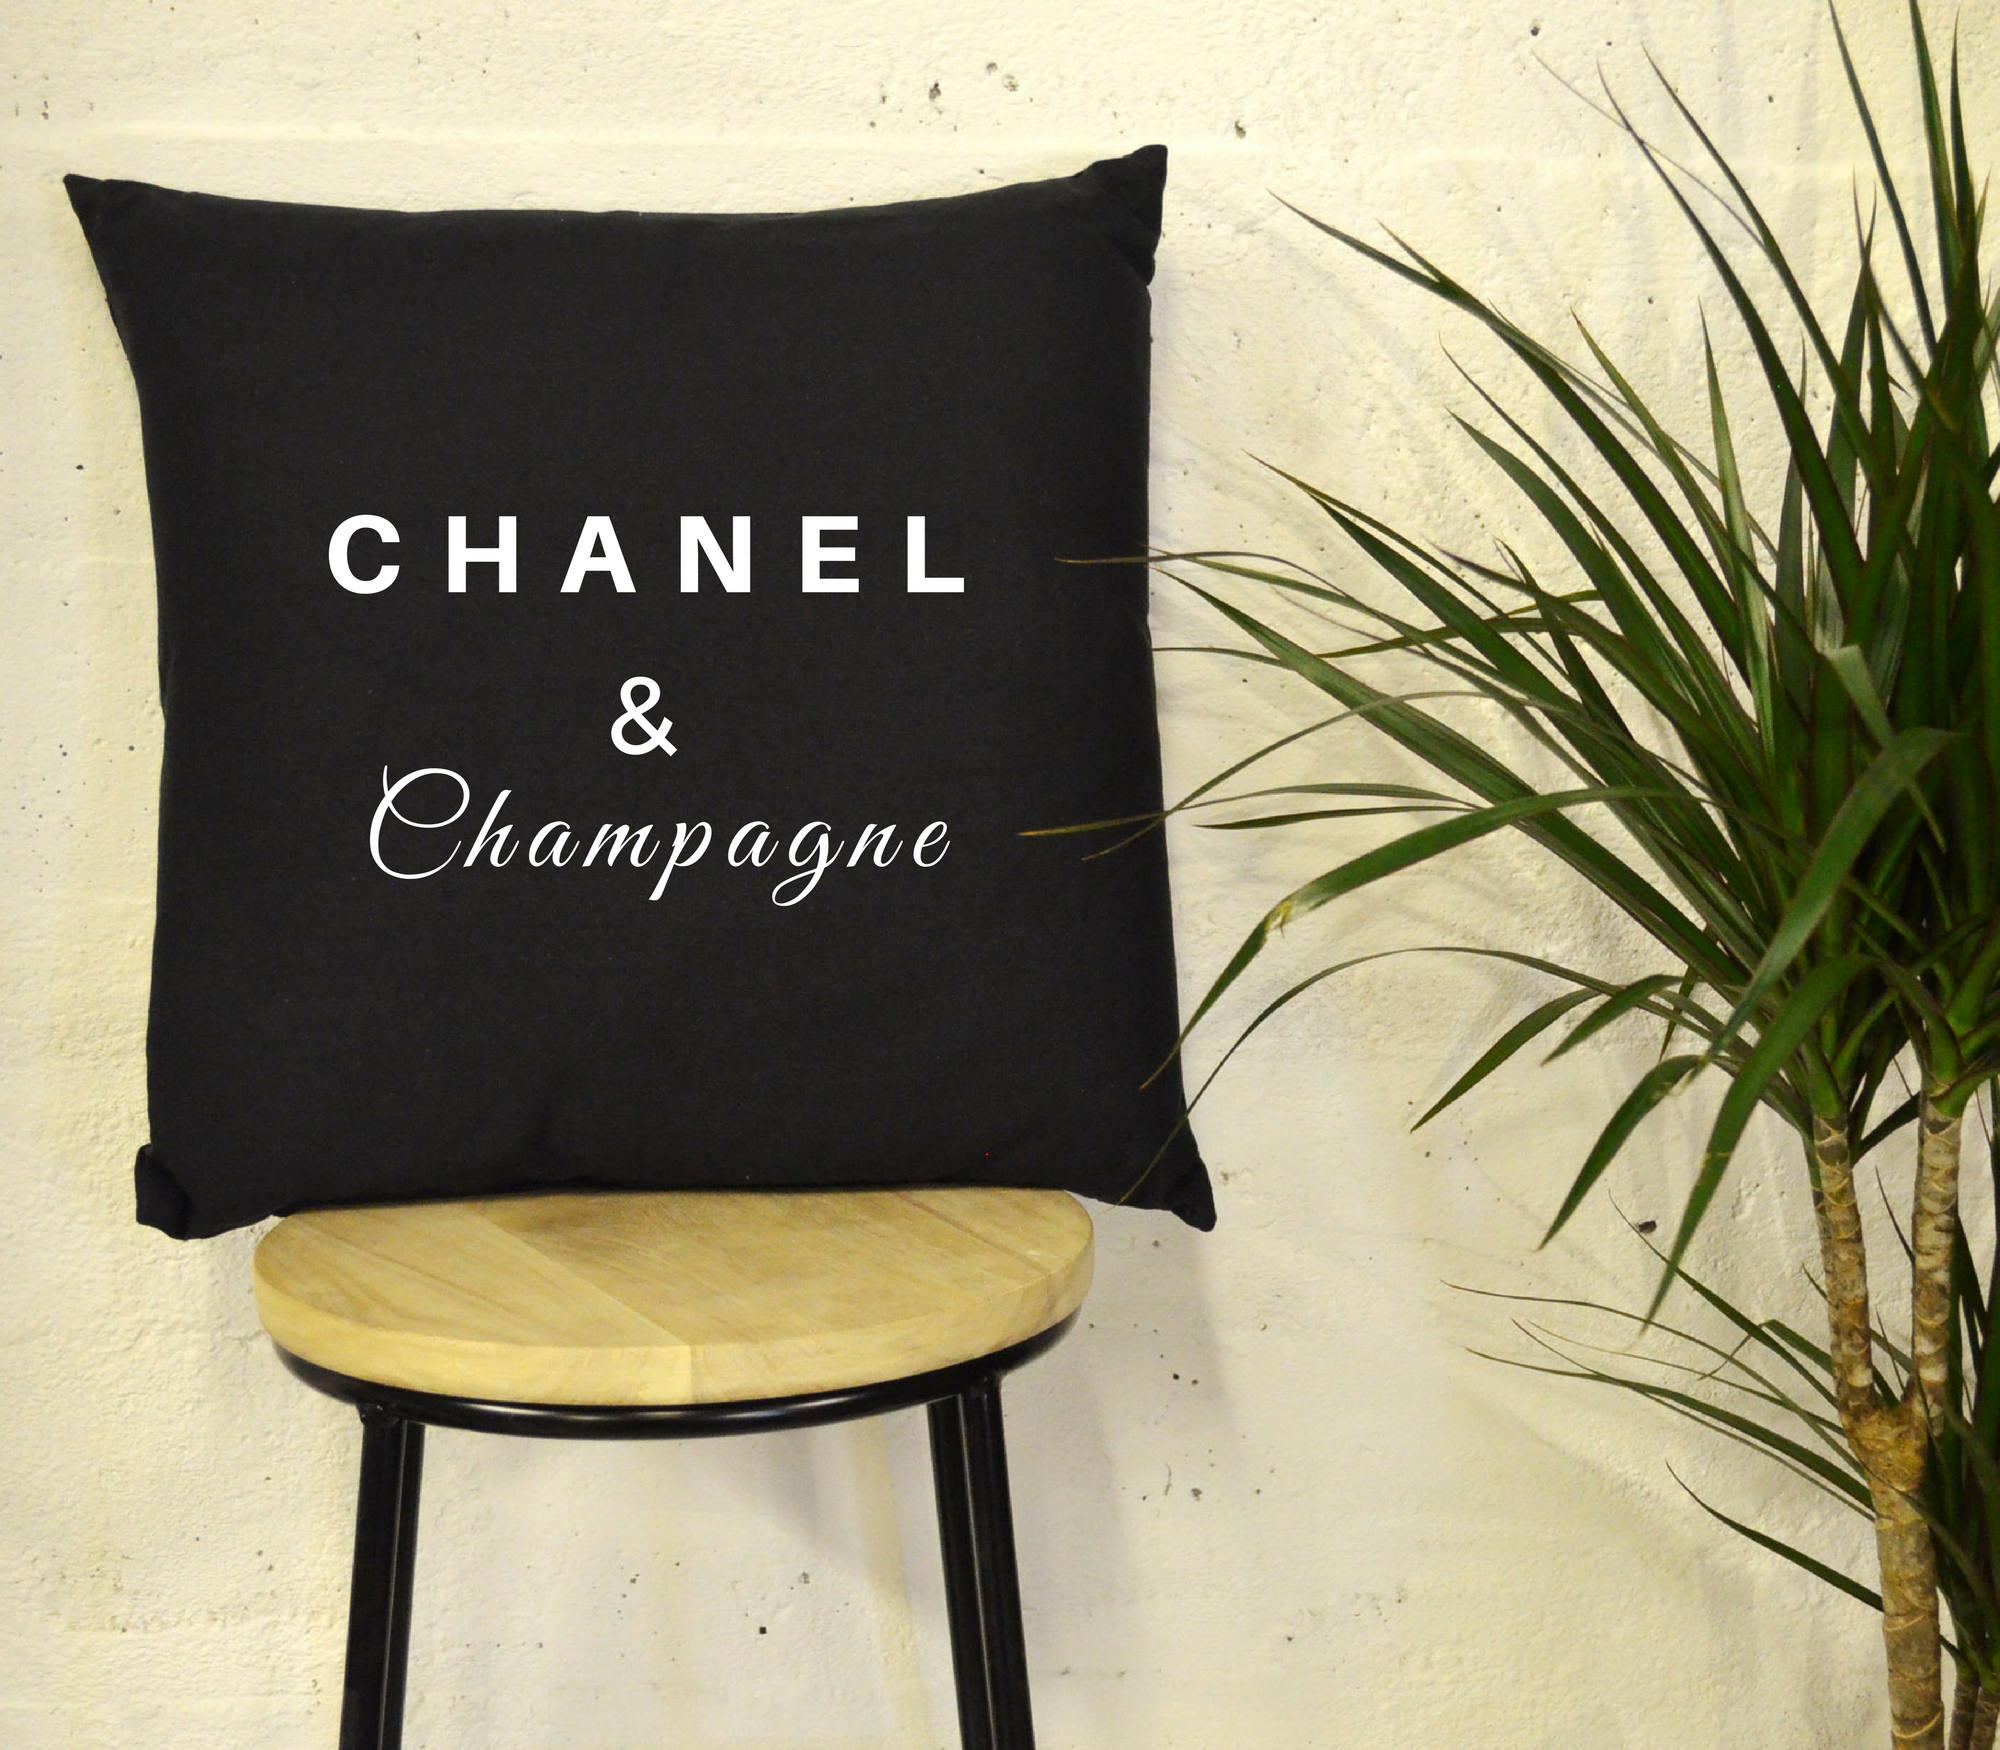 Chanel  Champagne Black and White Monochrome Pillow Cushion Birthday Present Chanel Designer Style High Fashion